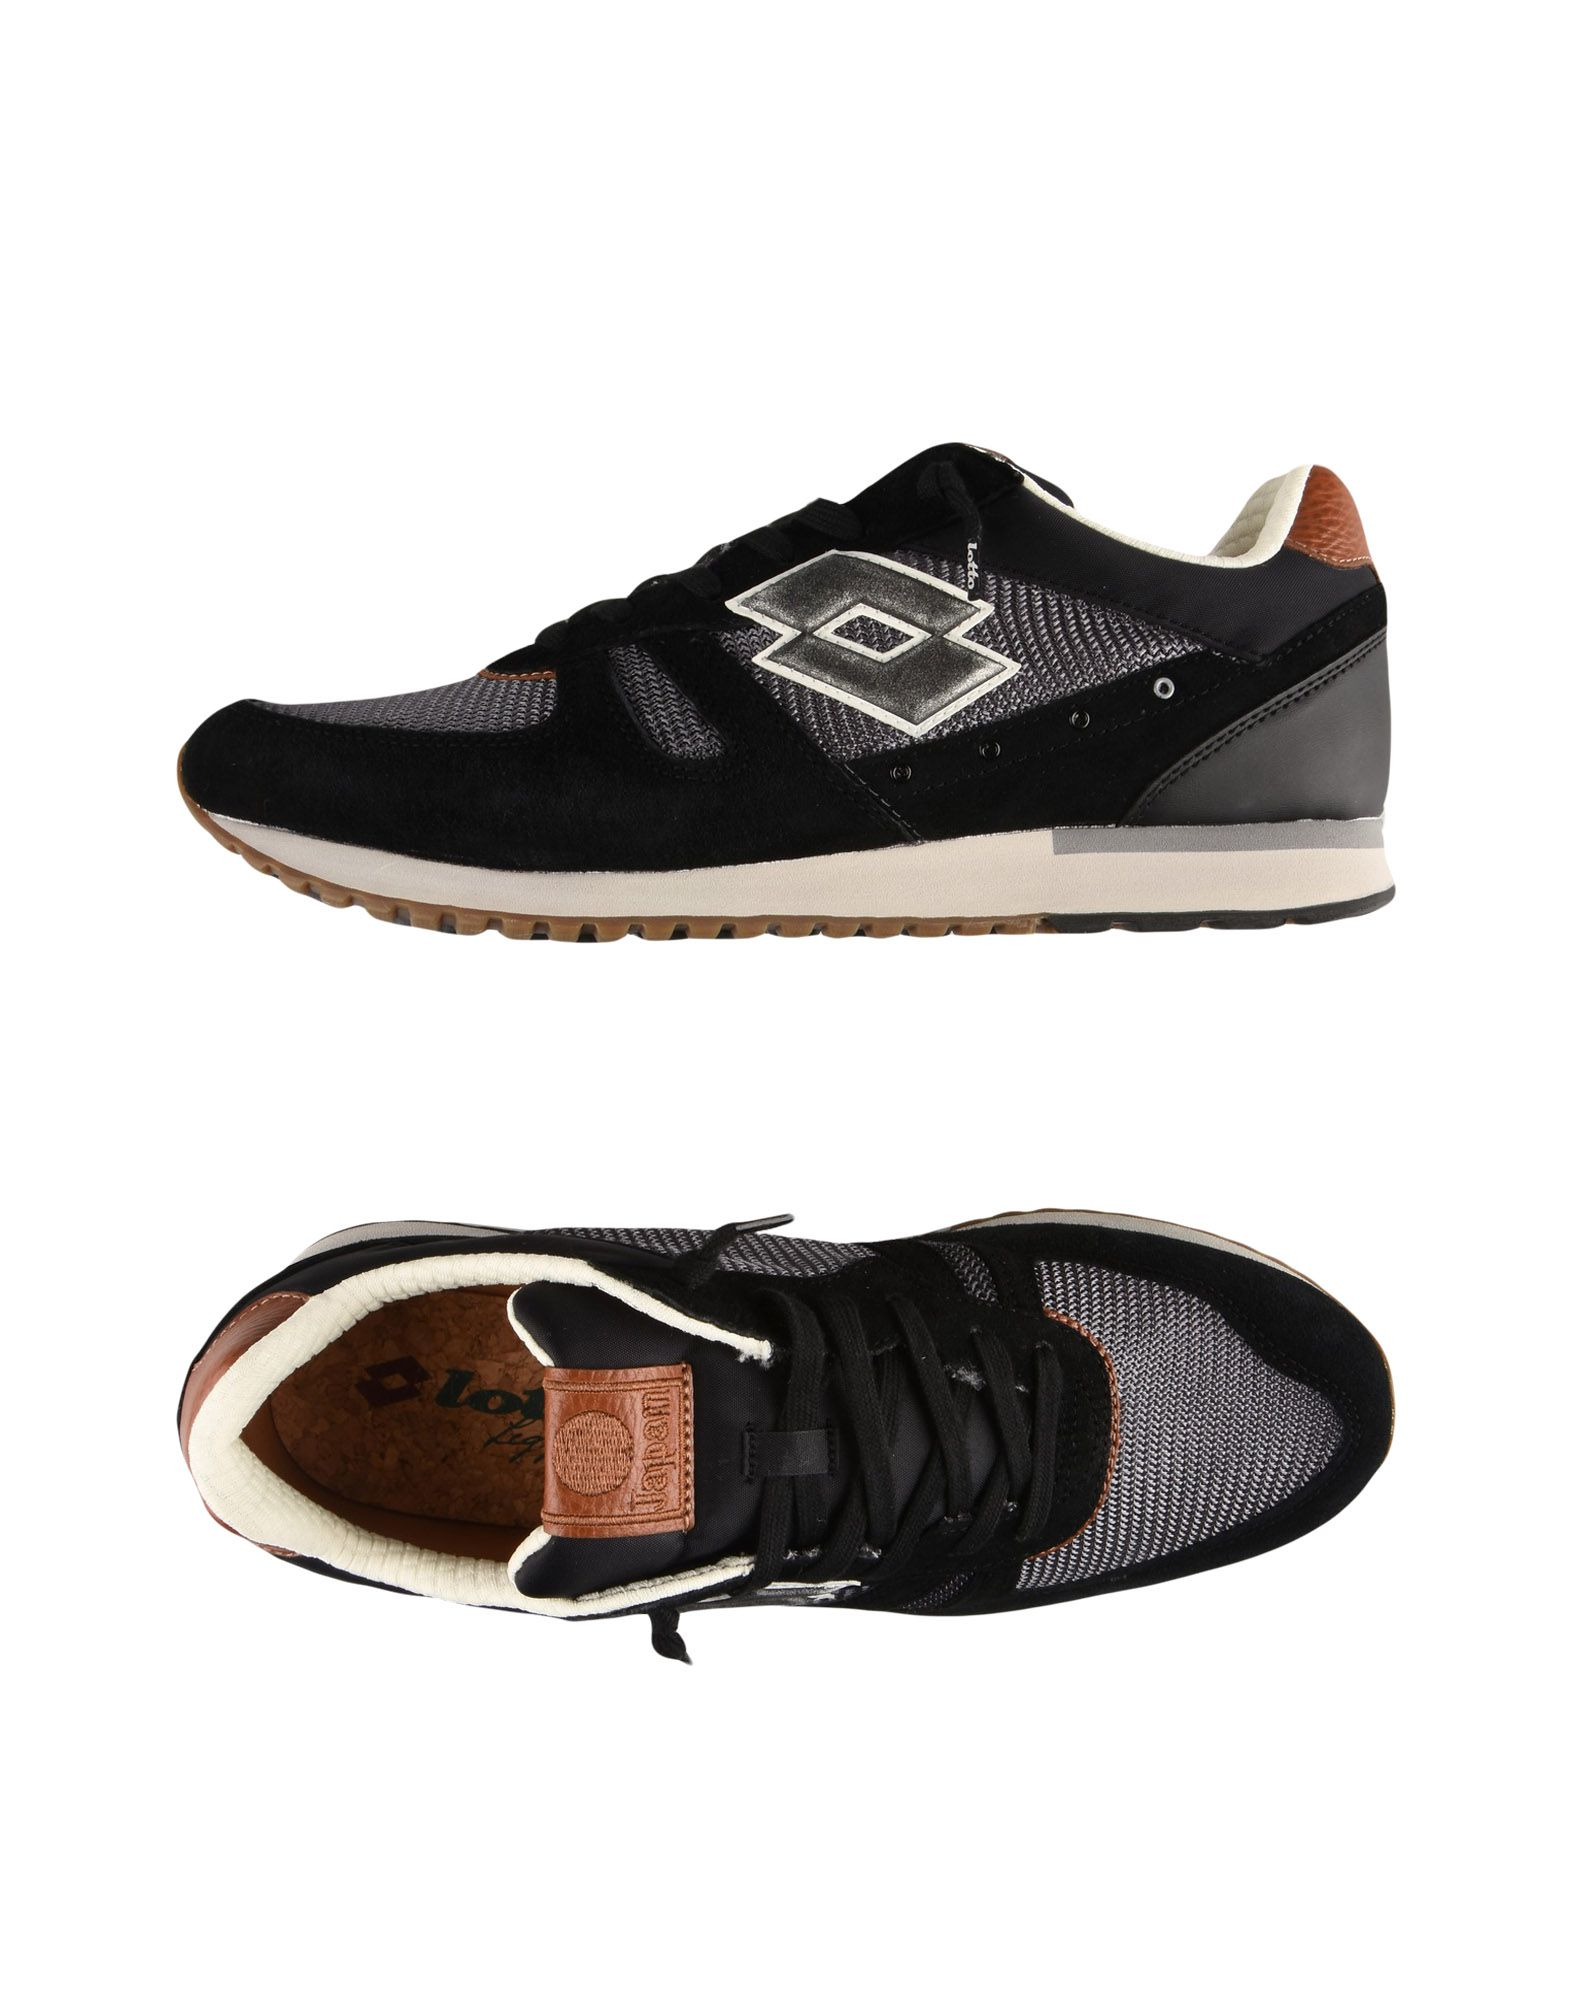 Sneakers Lotto Leggenda  Tokyo Shibuya - Homme - Sneakers Lotto Leggenda  Noir Réduction de prix saisonnier, remise